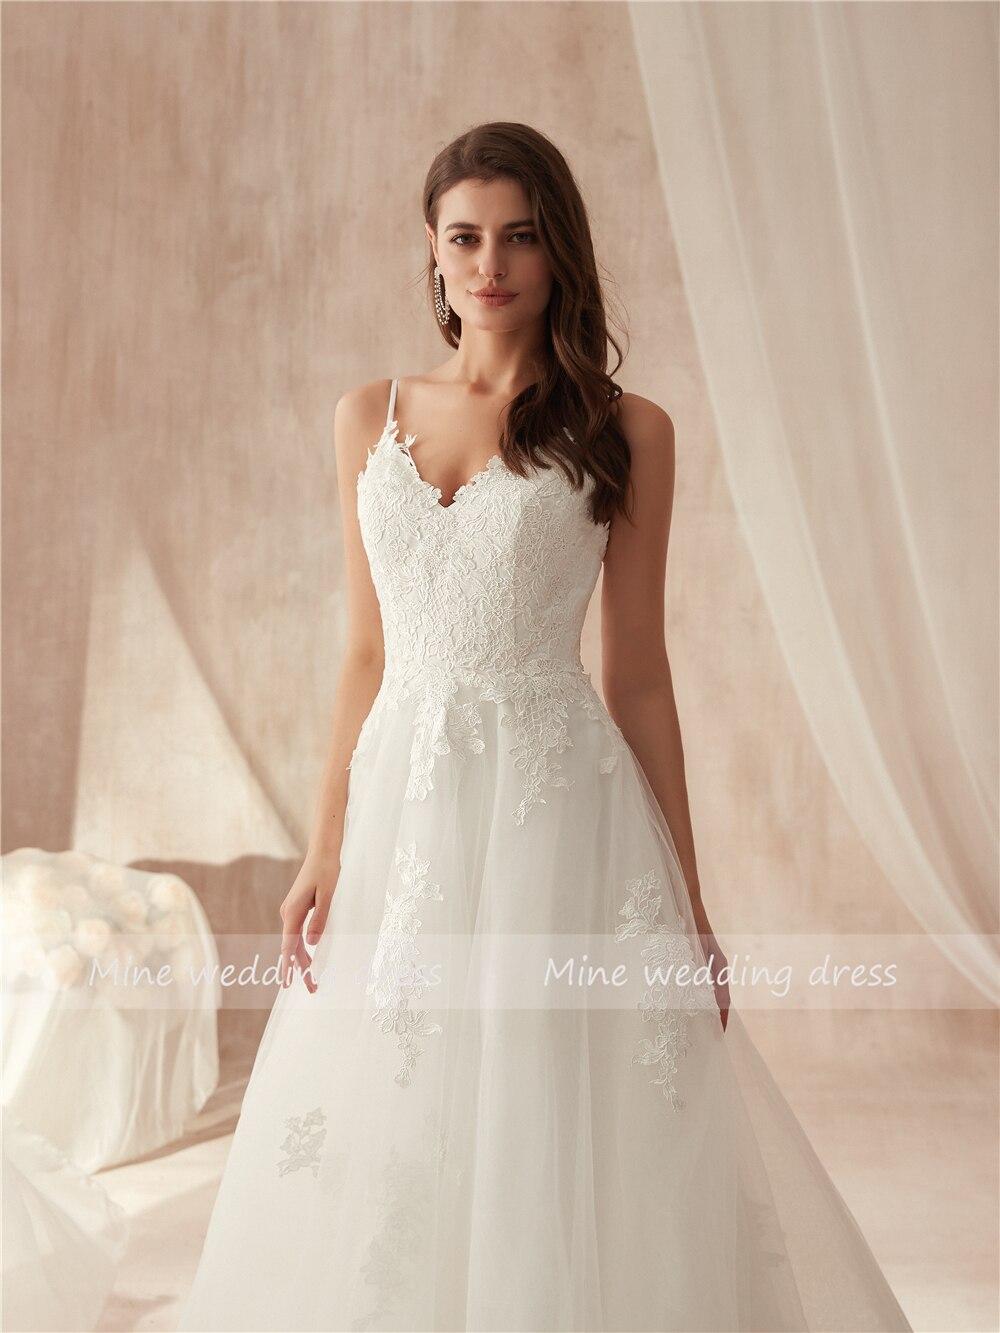 Image 4 - Spaghetti Straps Applique Lace A line Wedding Dress vestido de festa longo de luxo Bridal Gowns New Fashinon 2019 New-in Wedding Dresses from Weddings & Events